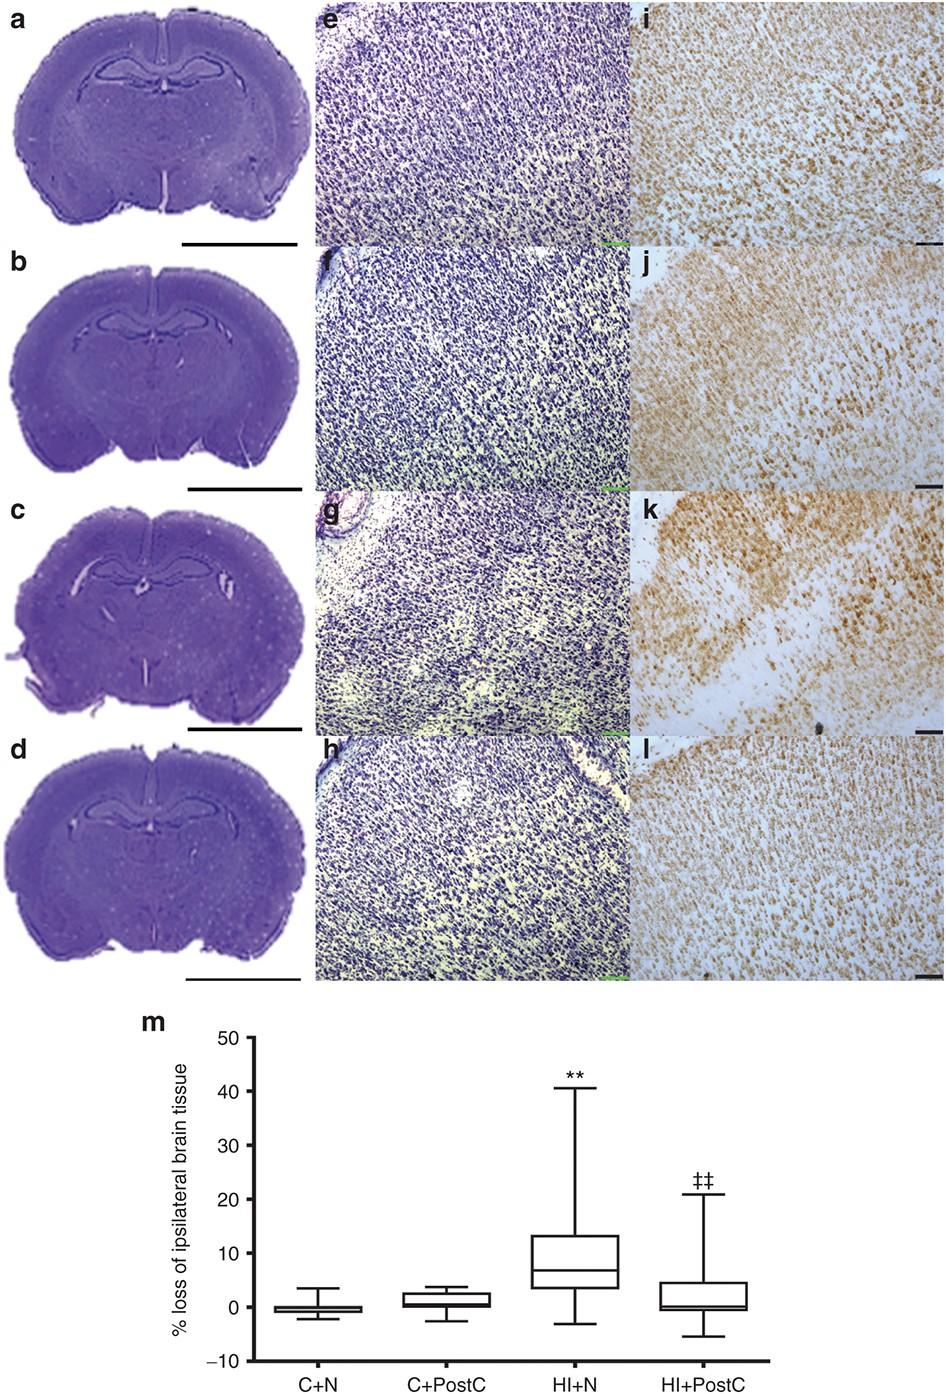 Hypoxic postconditioning reduces microglial activation